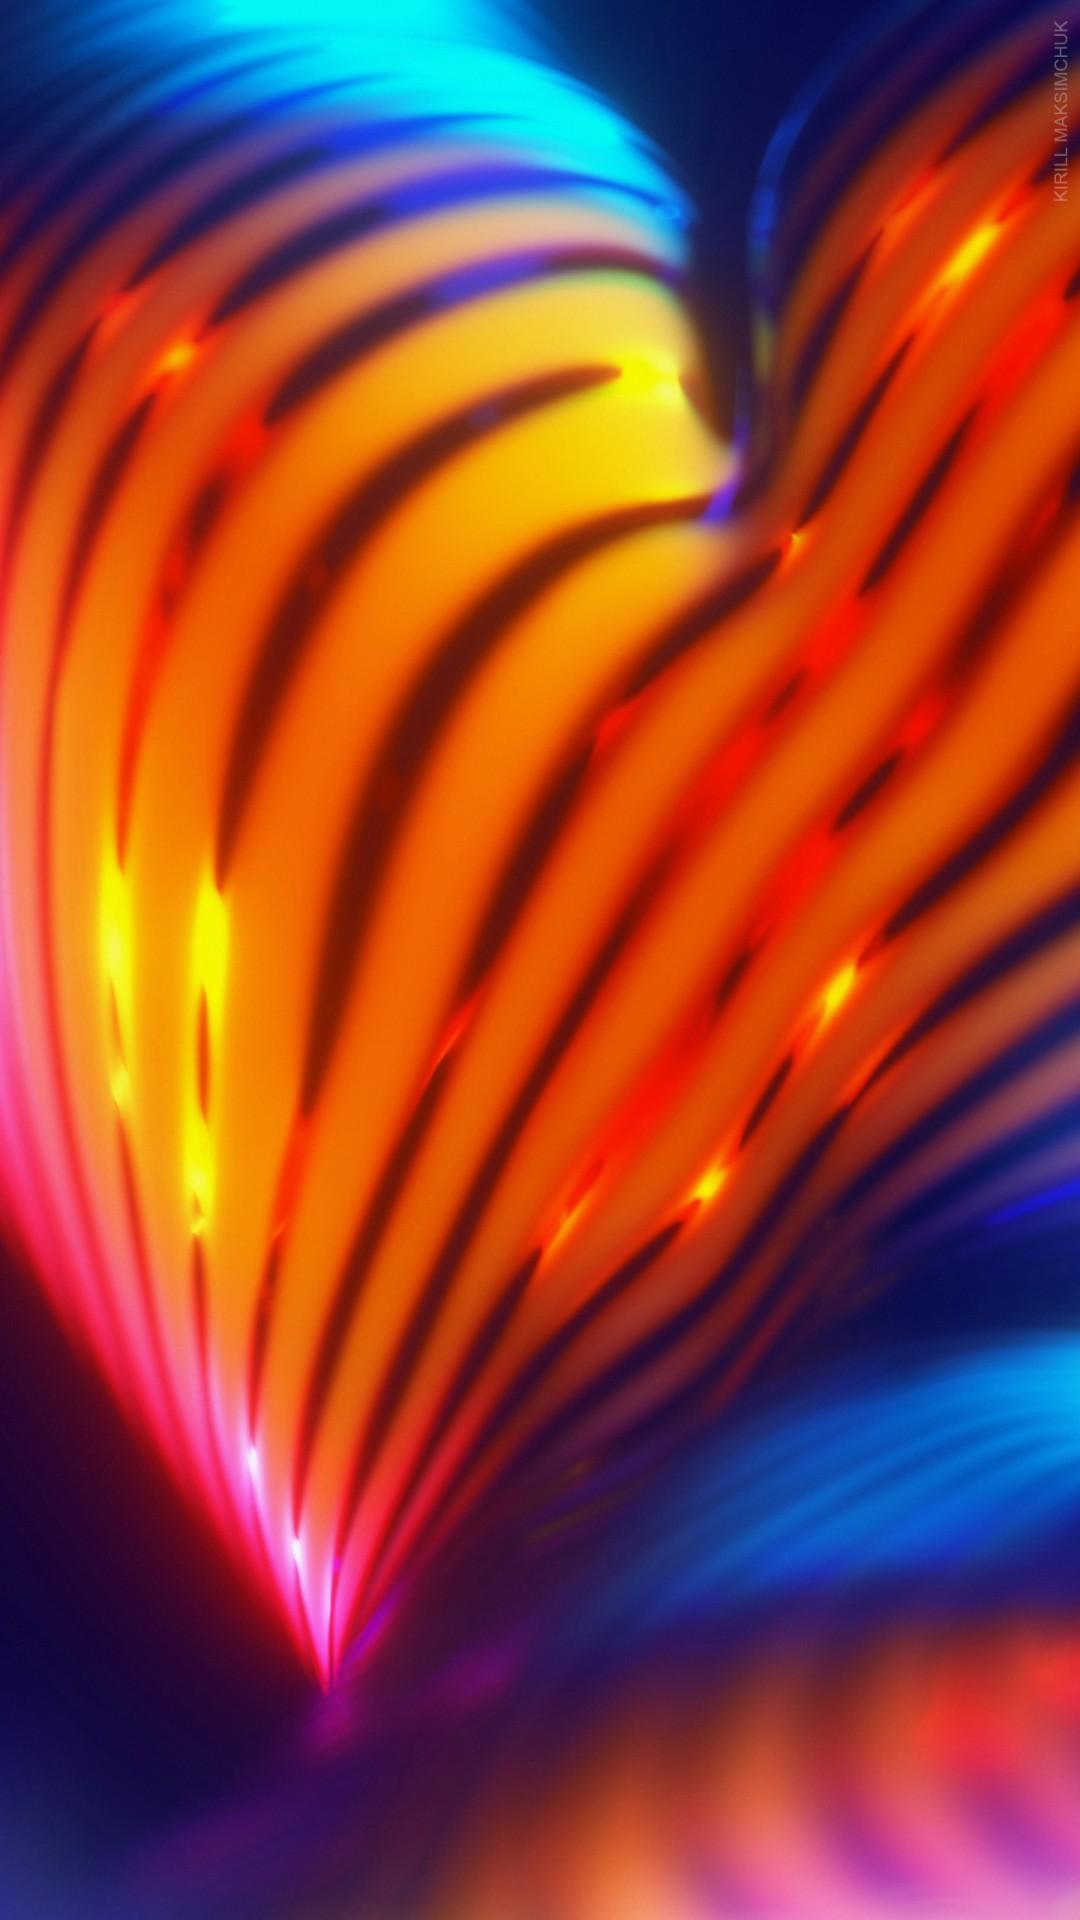 Iphone X Liquid Wallpaper Hd Android Neon Abstract Wallpapers Hd Wallpapers Id 25673